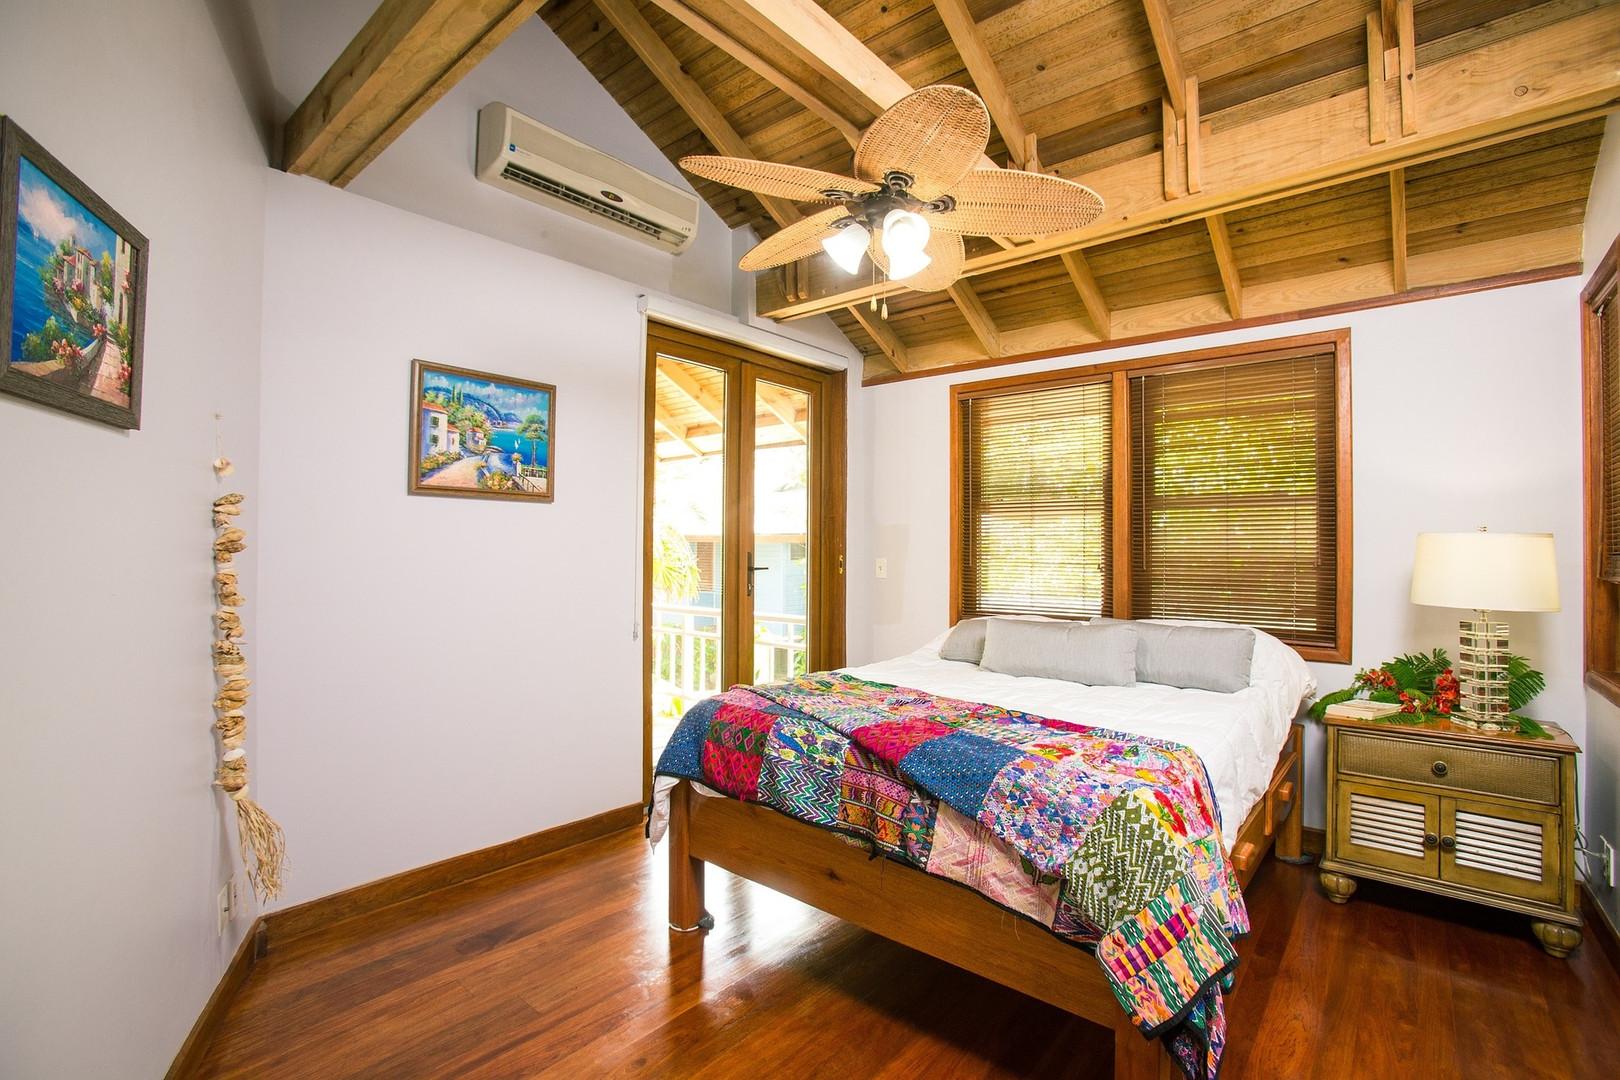 beach-house-1505461_1920.jpg